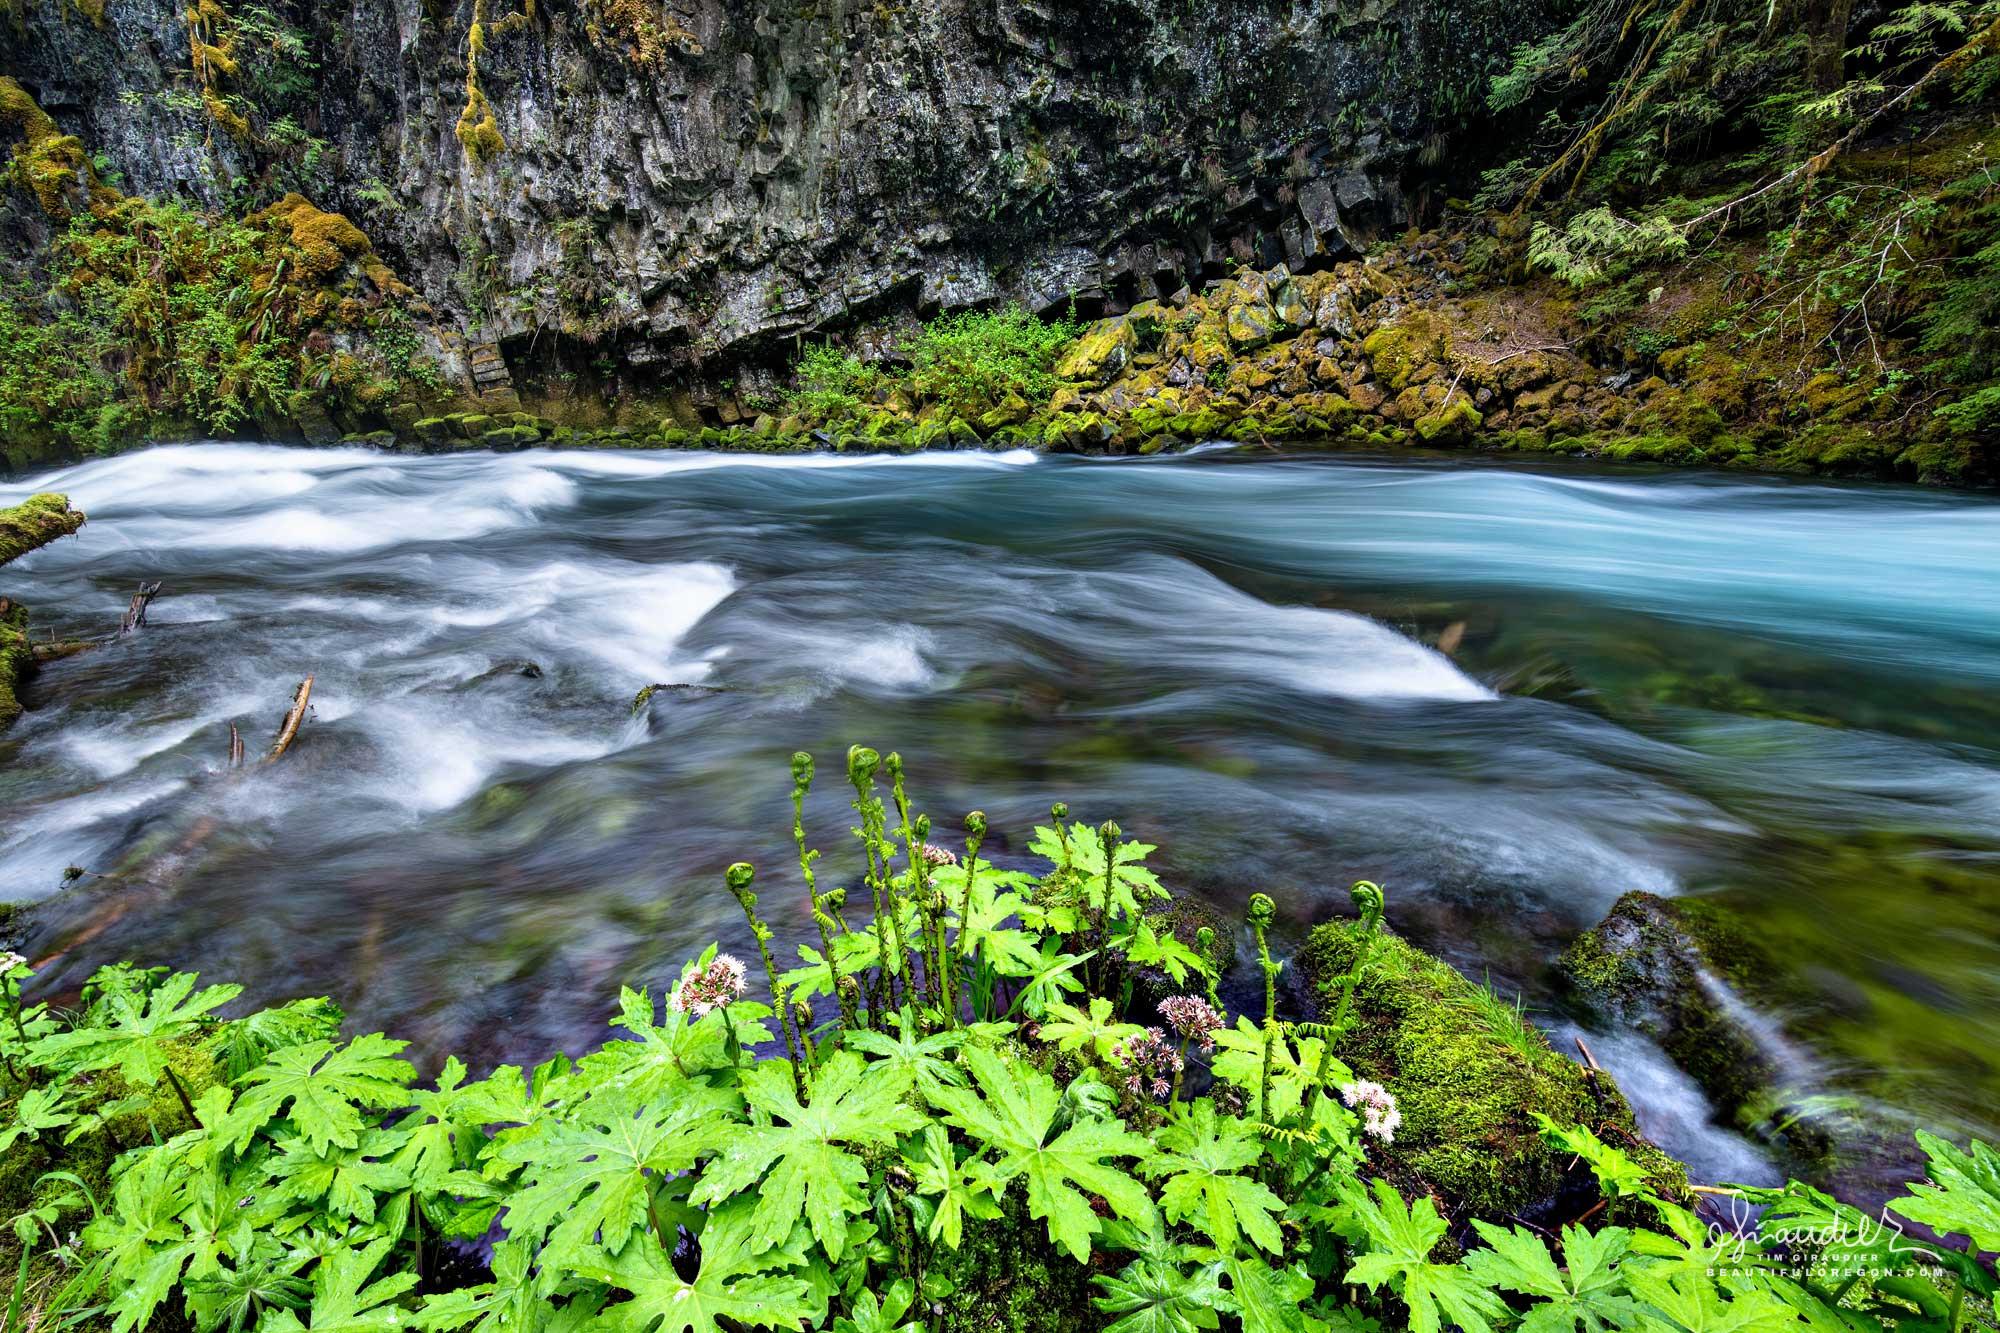 Palmate Coltsfoot (Petasites palmatus) and Lady Fern (Athyrium filix-femina) thrive along the McKenzie River. Willamette National Forest, Oregon West Cascades.